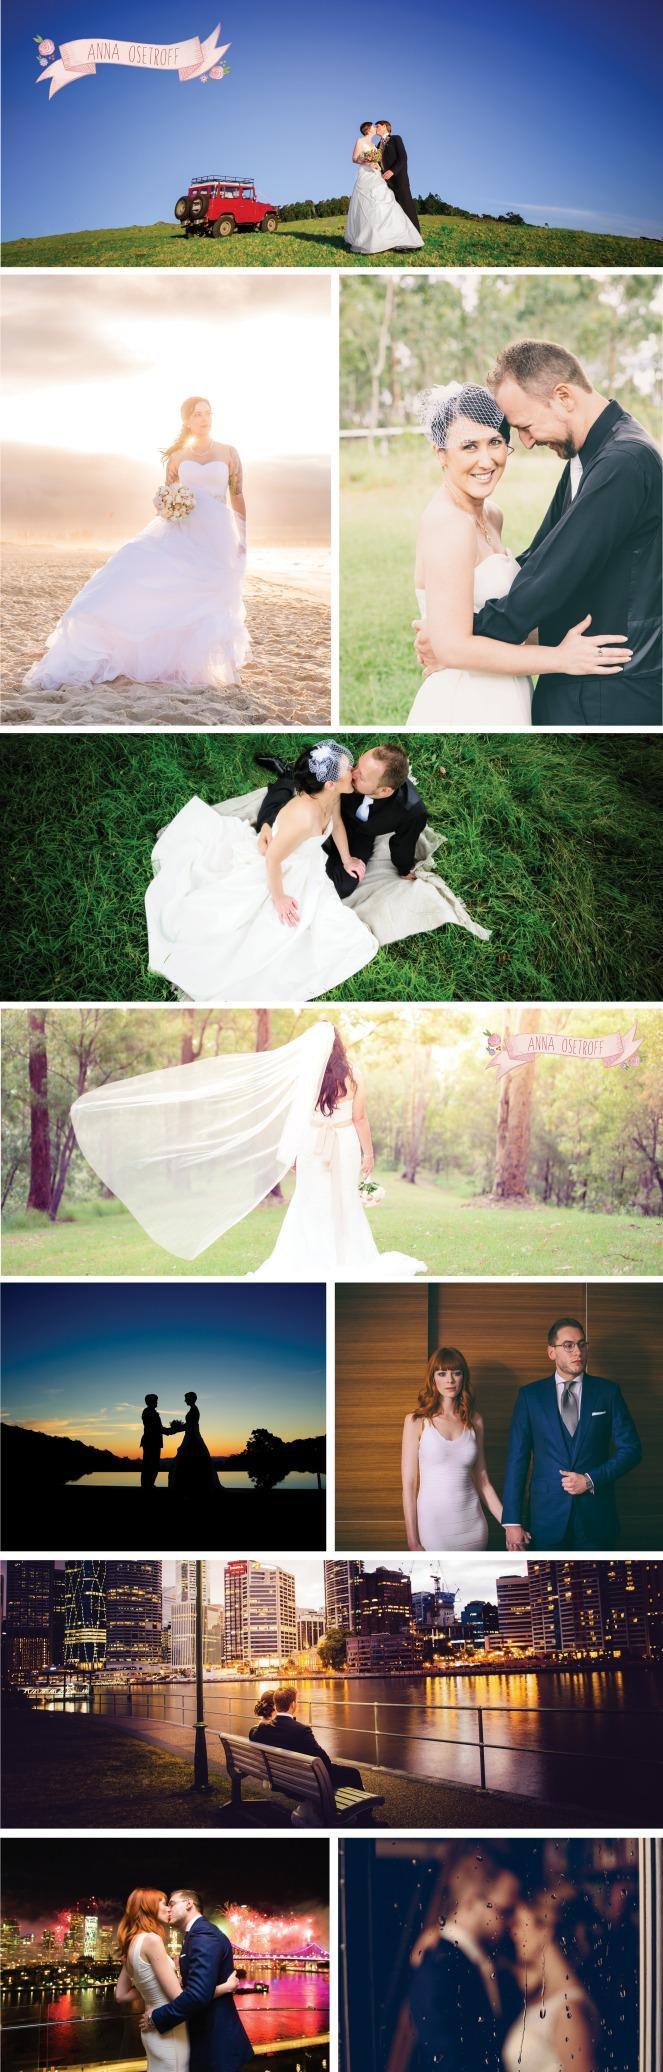 Anna Osetroff Brisbane Wedding Photographer Photo layout Homepage